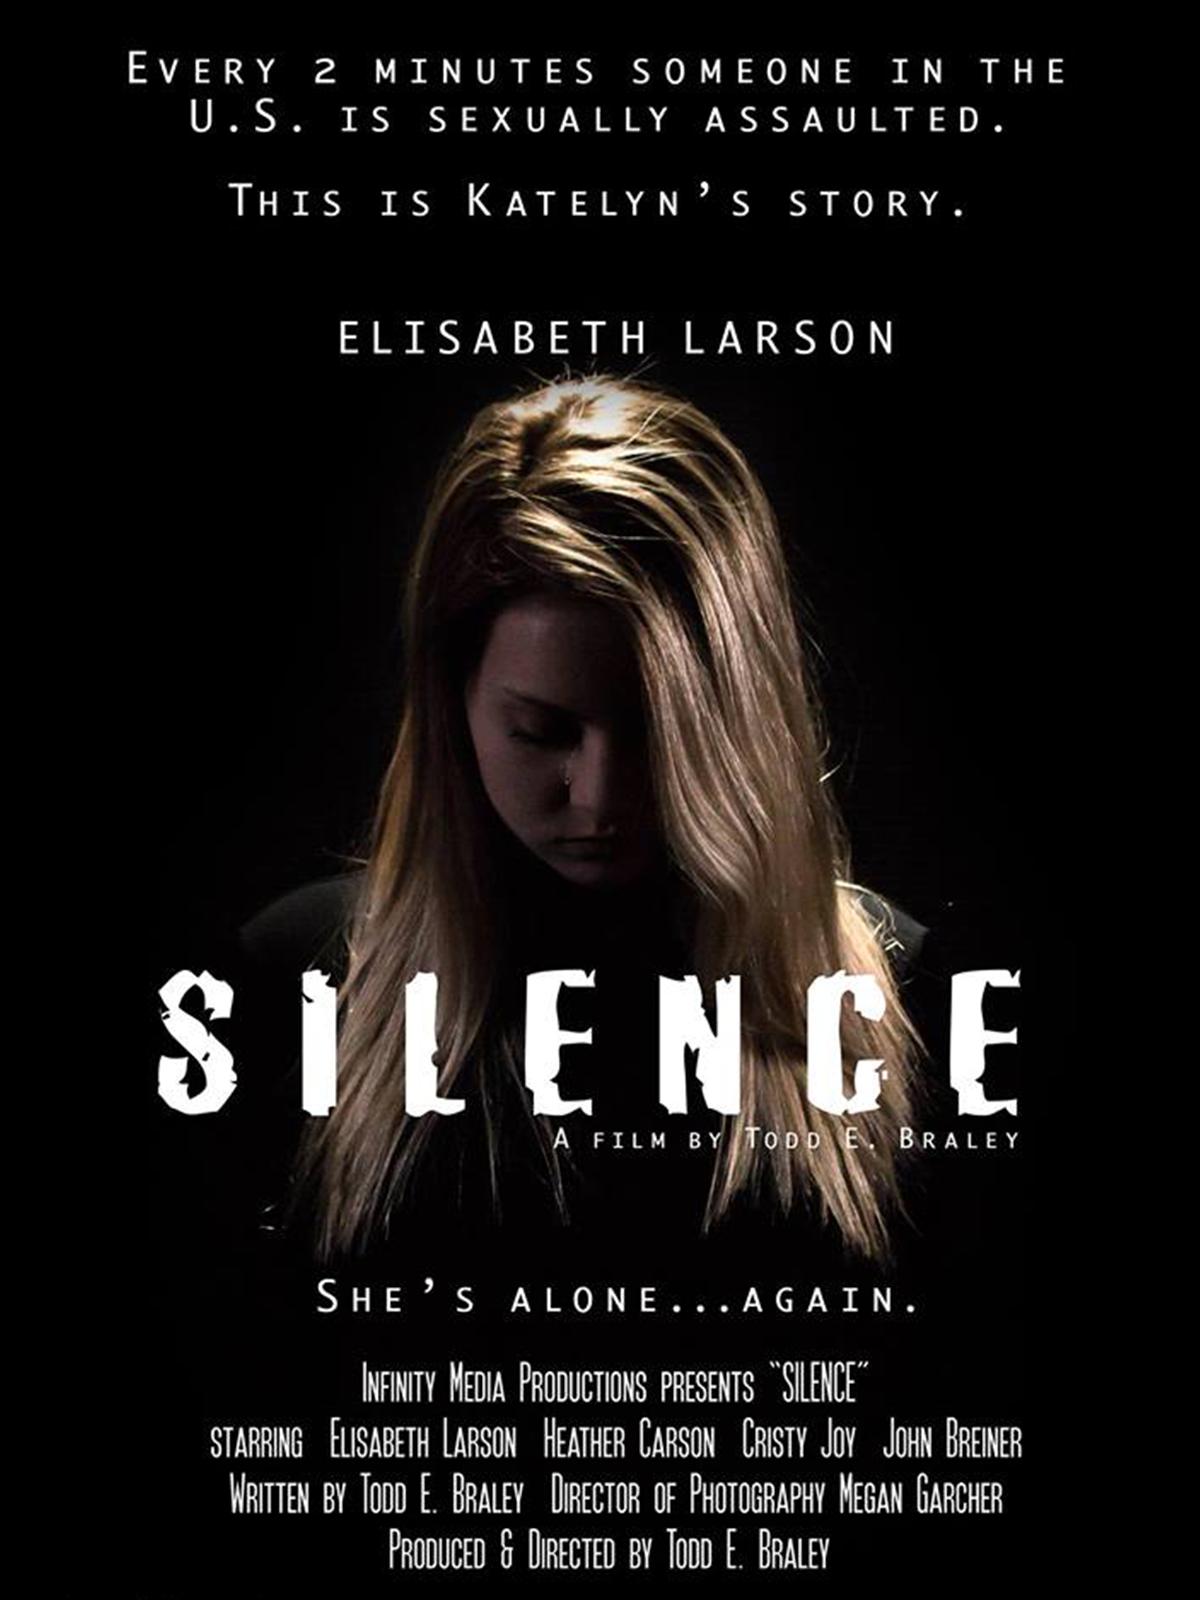 SILENCE_1200X1600 ARTWORK